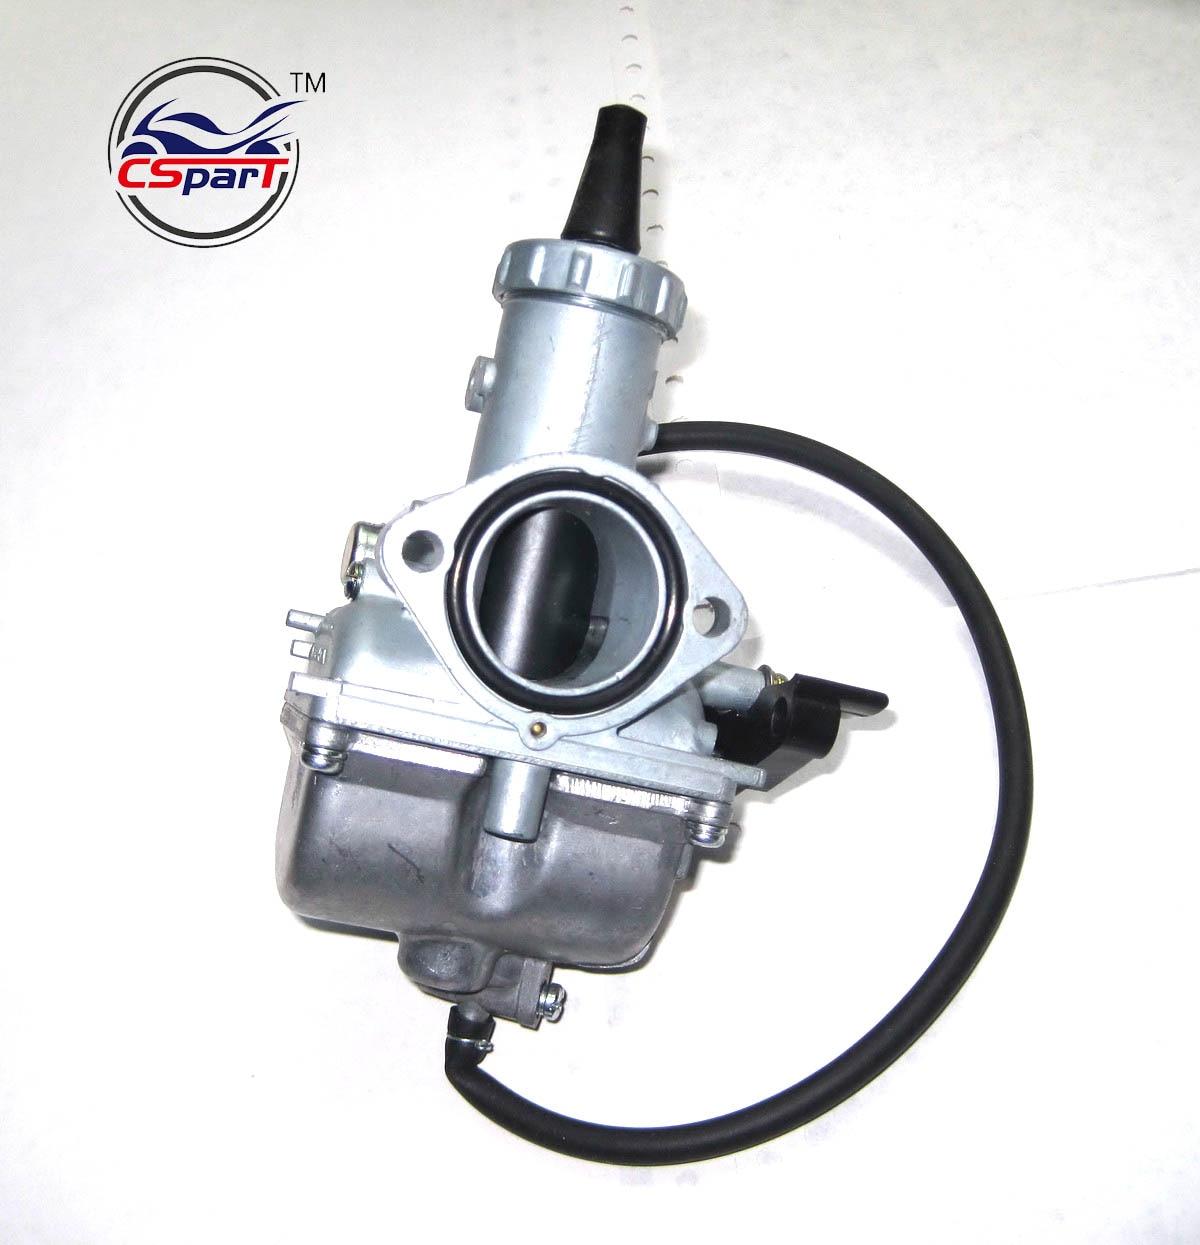 Mikuni VM26 30mm PZ30 main starter carburateur pour Honda 125CC 140CC 150cc 200cc 250cc ATV Quad Dirt Bike